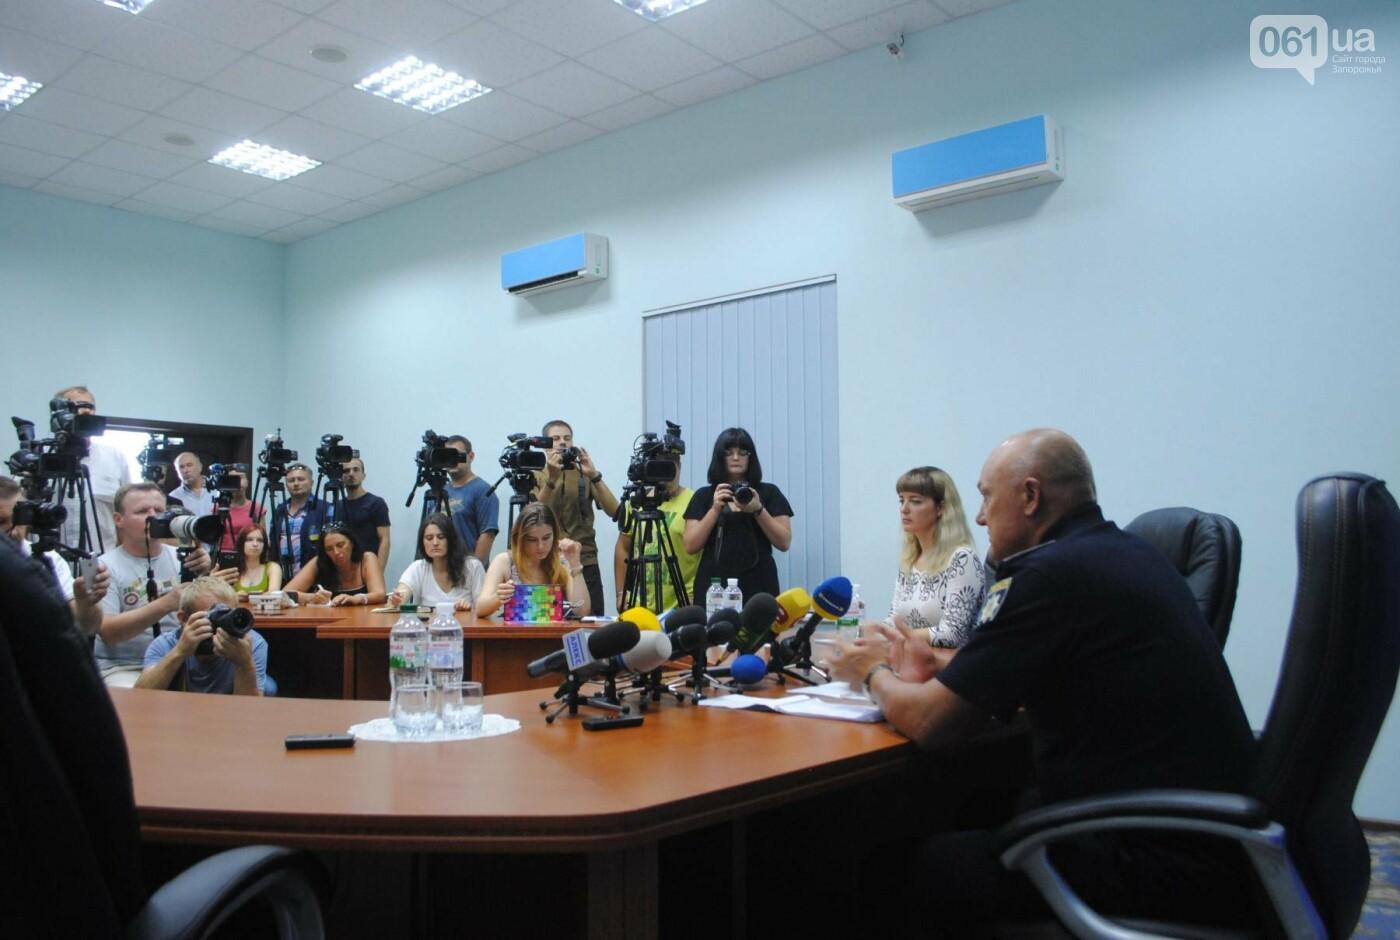 За Олешко следили два дня: в полиции рассказали подробности покушения в Бердянске, - ФОТО, фото-2